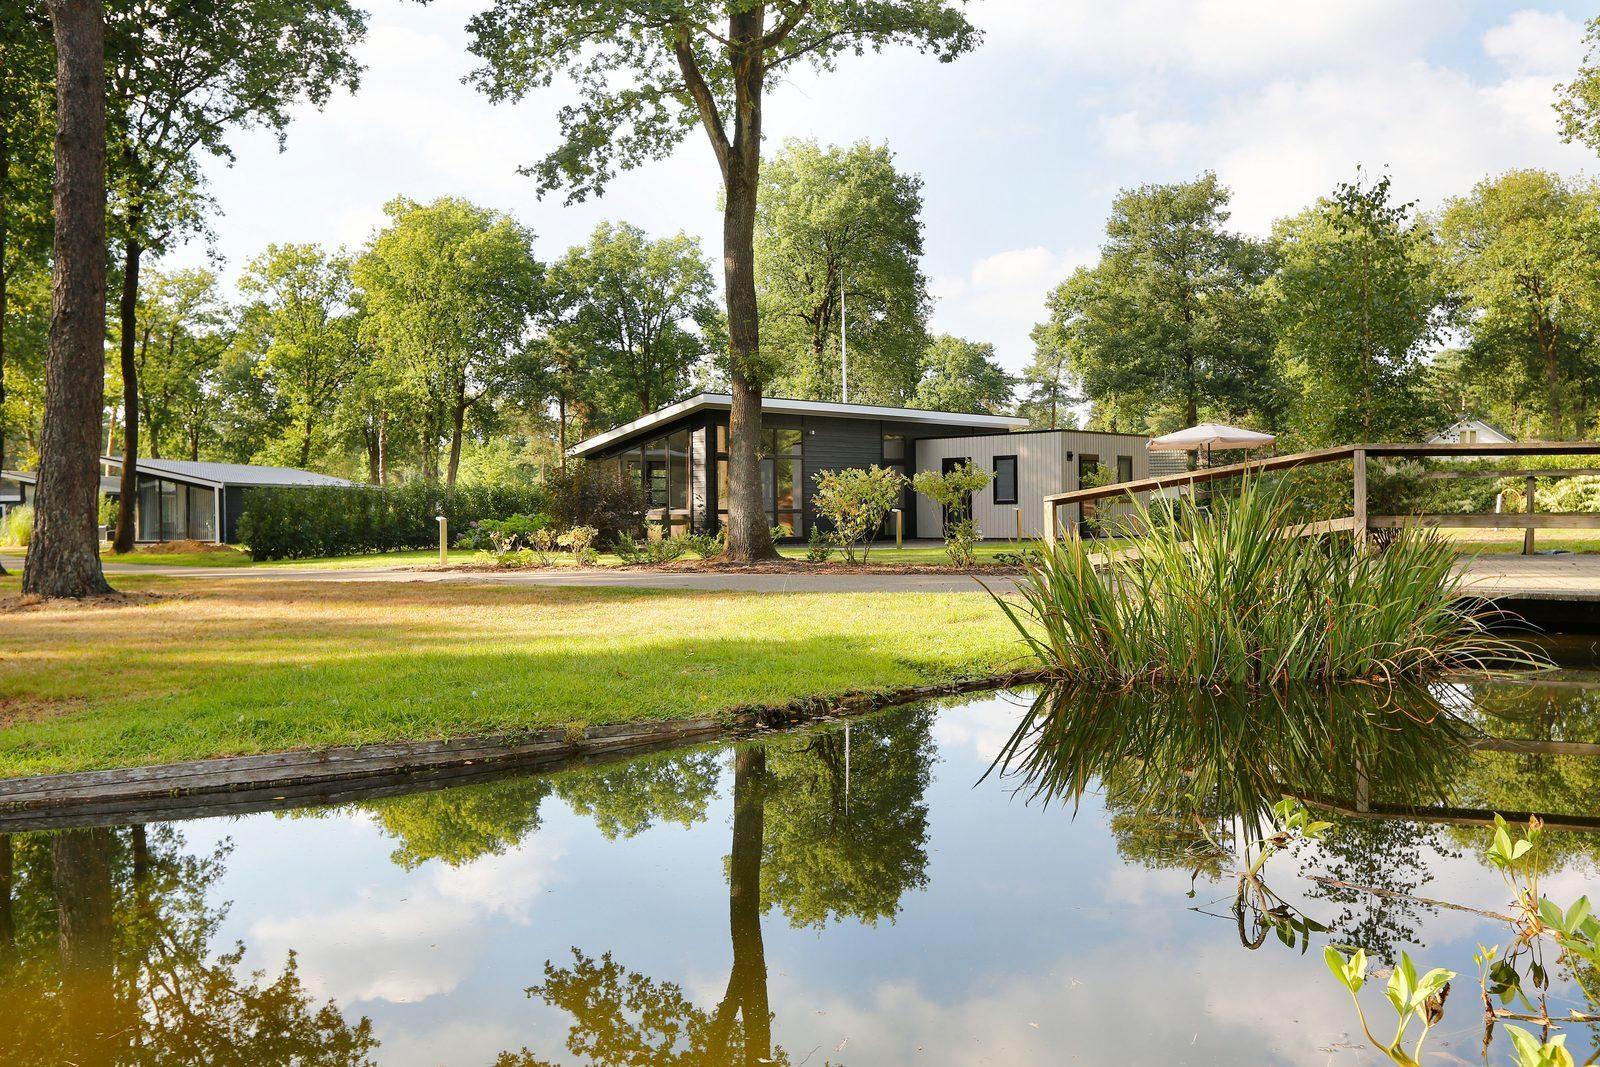 Bospark Hessenheem Markelo